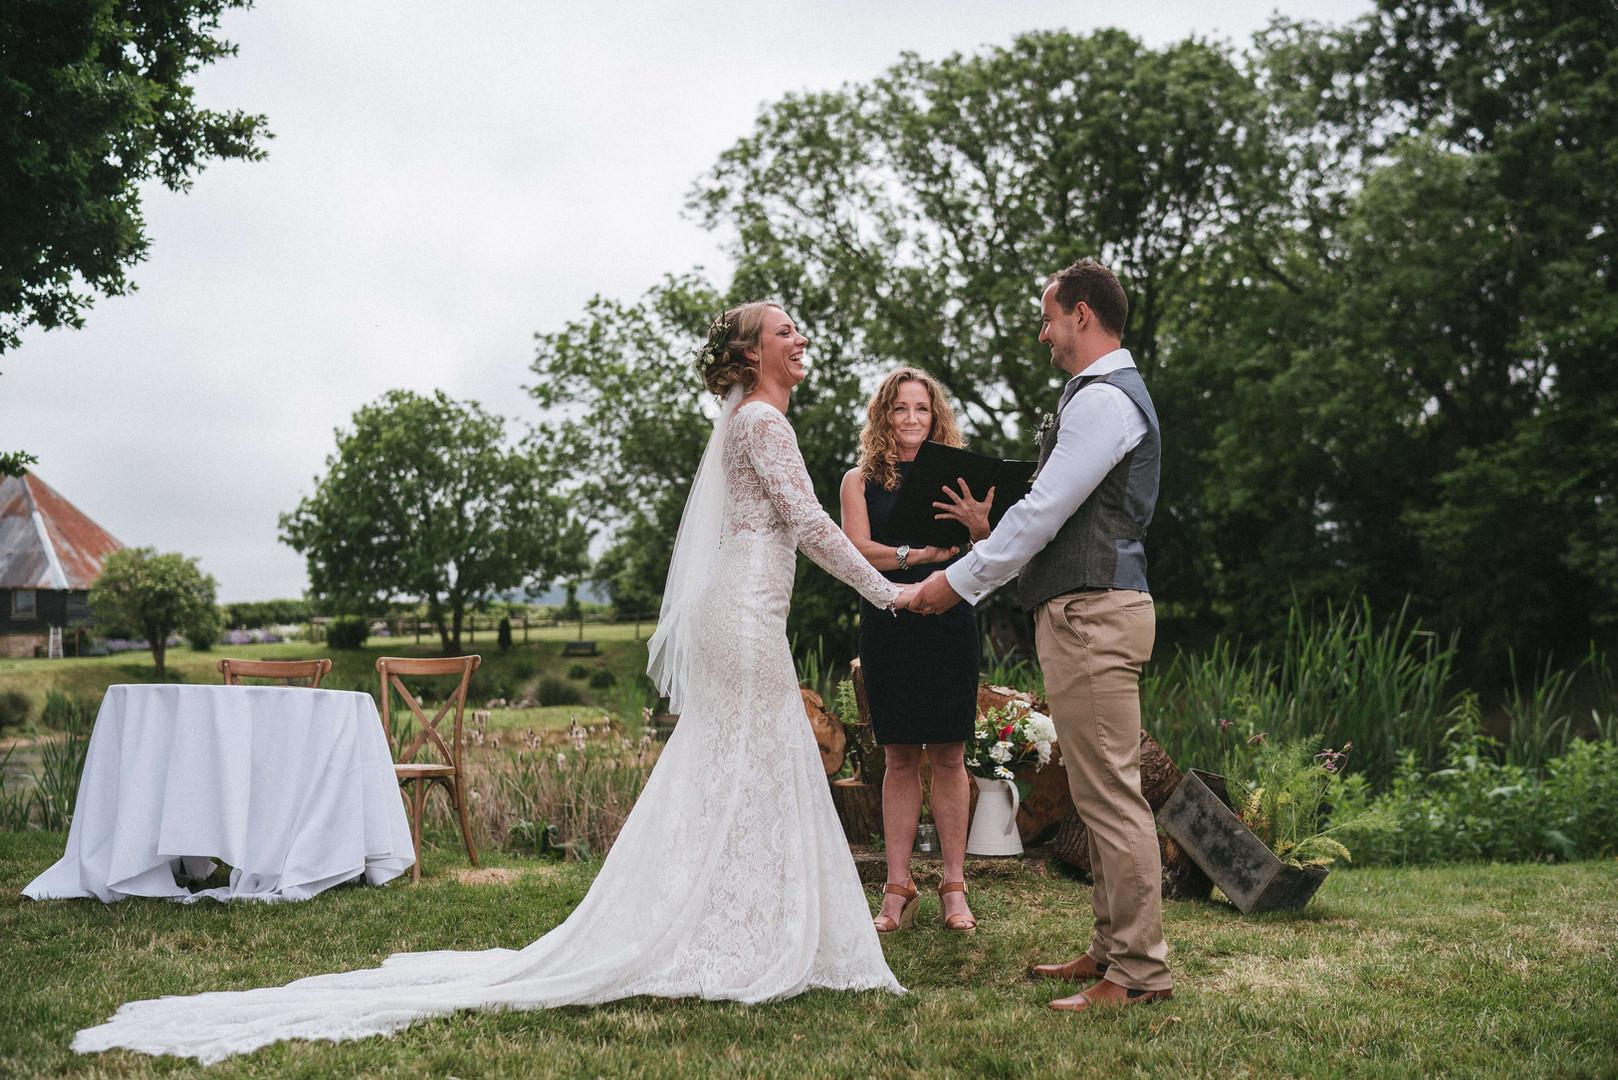 Karlina wedding celebrant conducting a wedding ceremony